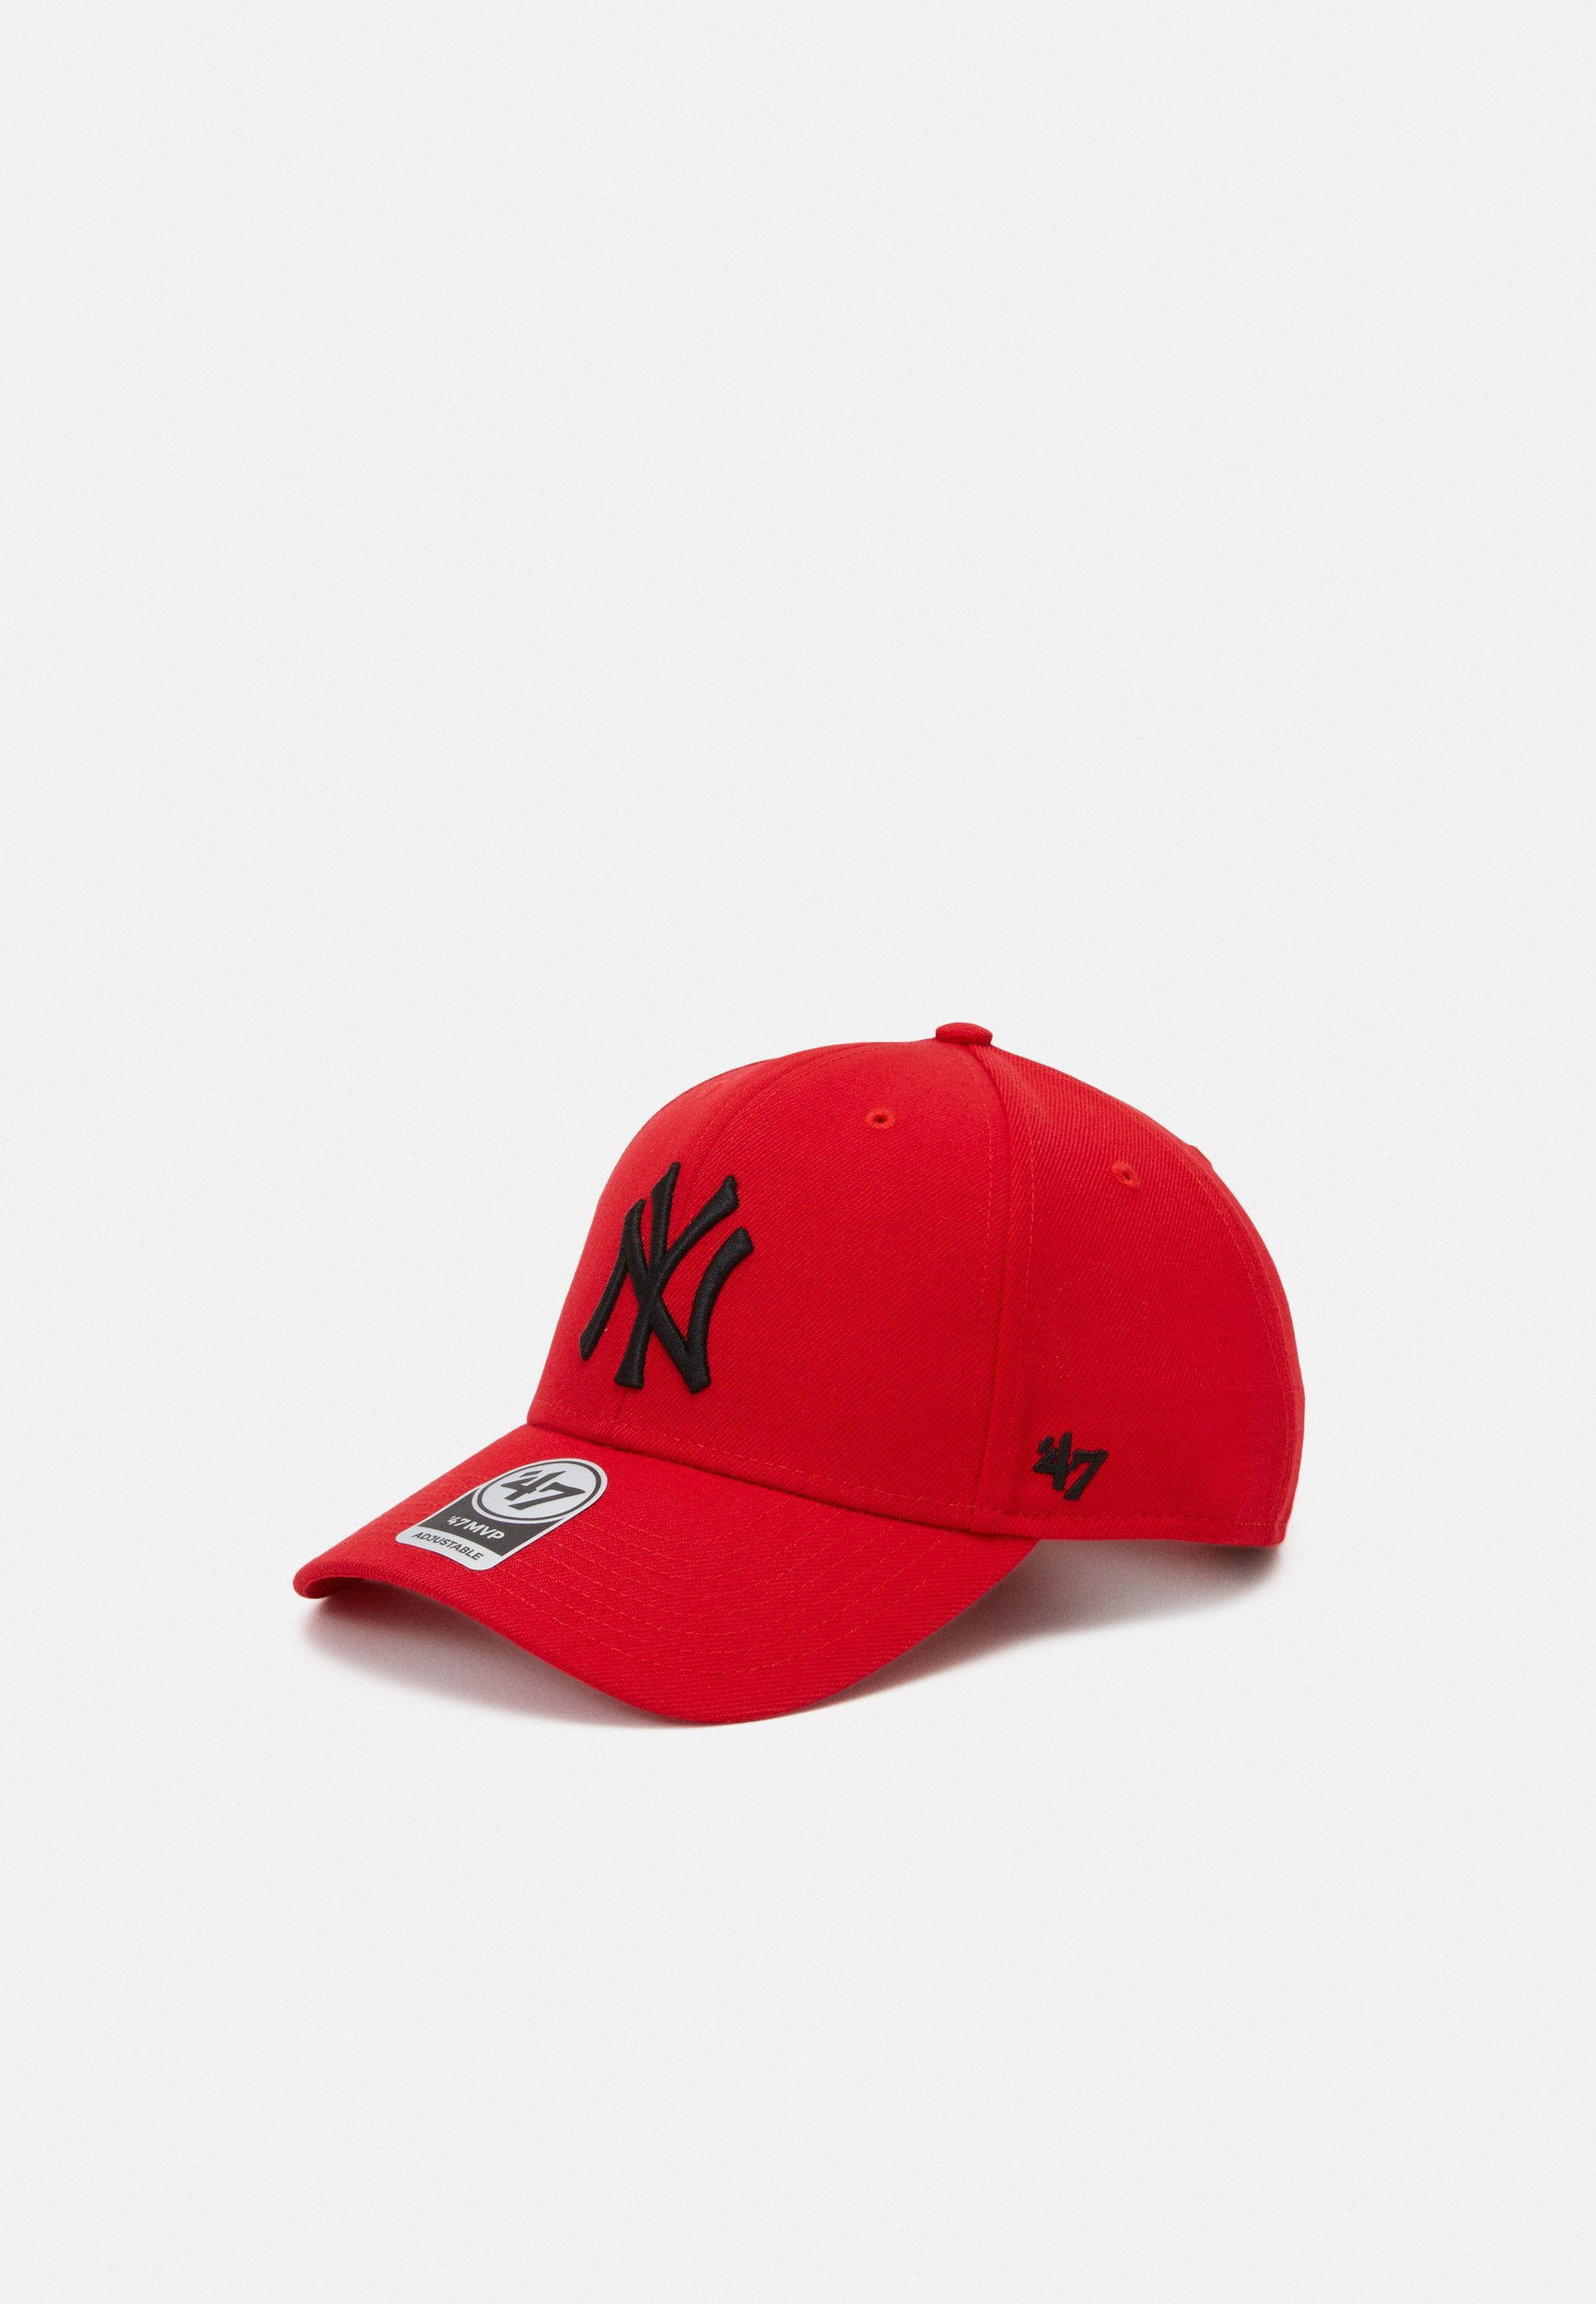 Hombre MLB NEW YORK YANKEES SNAPBACK UNISEX - Gorra